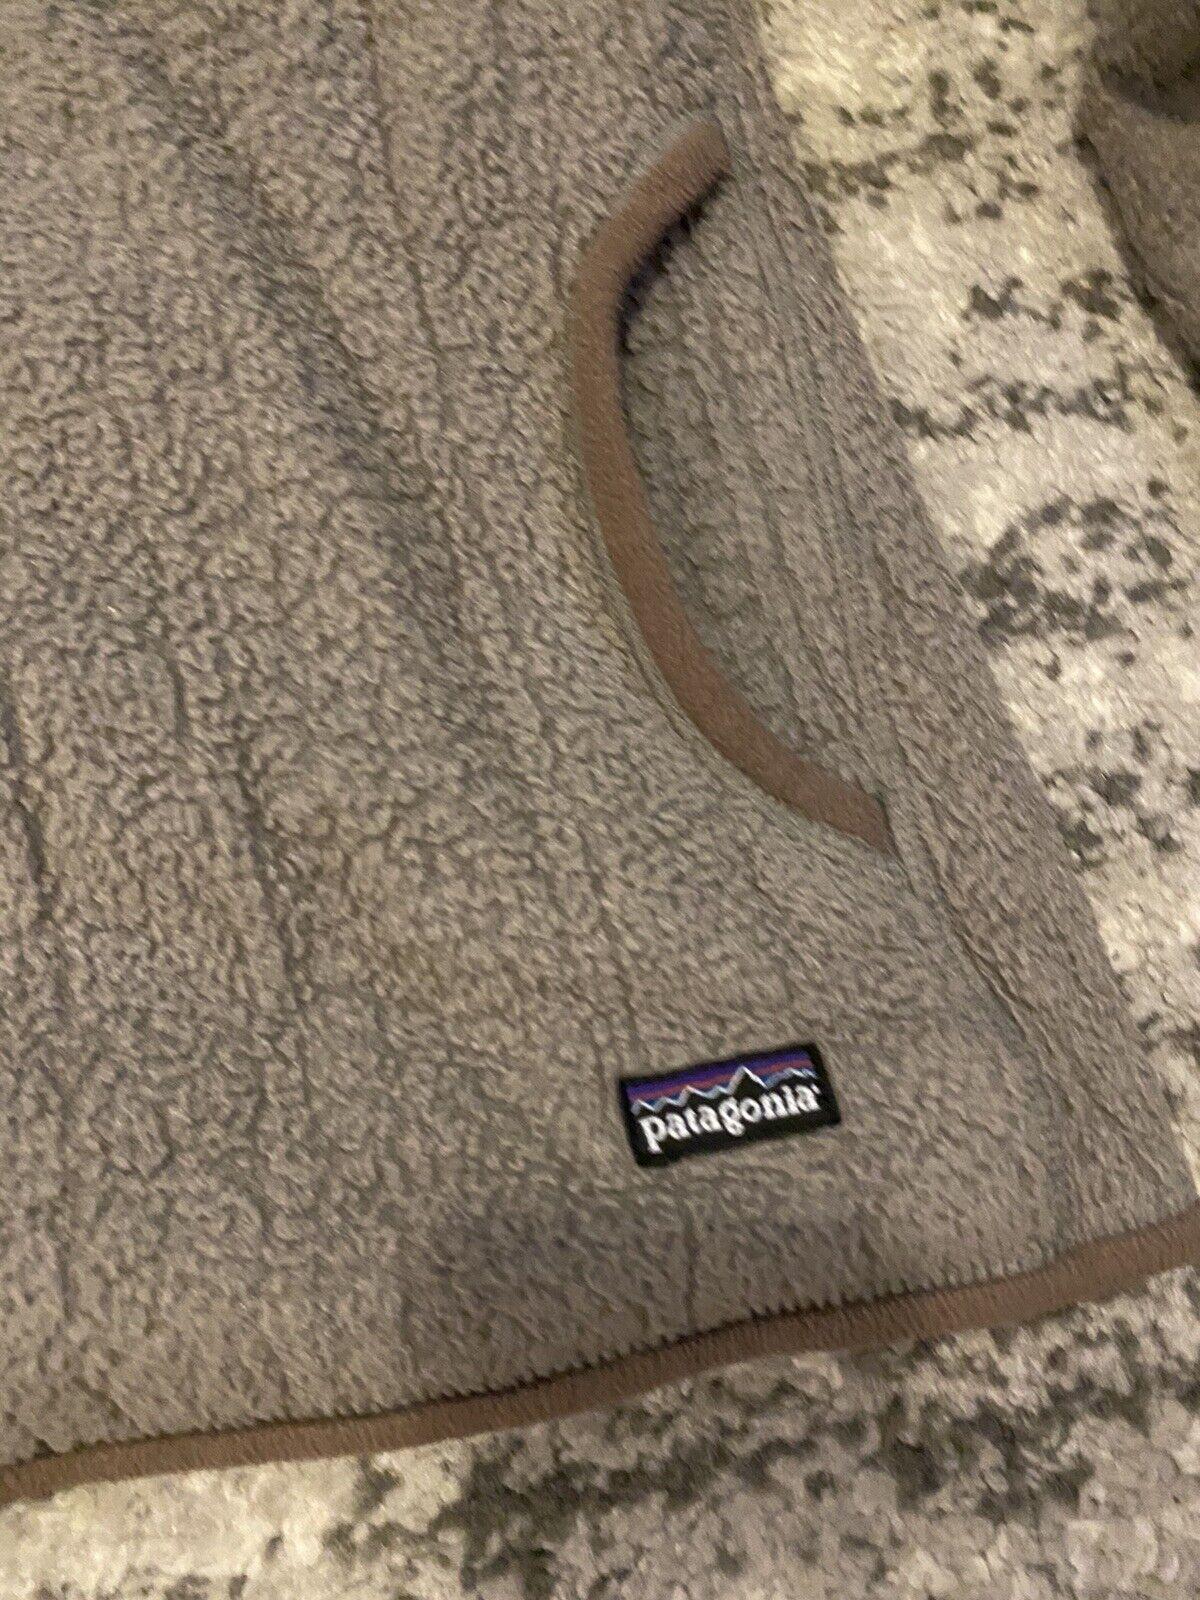 womens patagonia Jacket, High Pile, Full Zipper, Medium